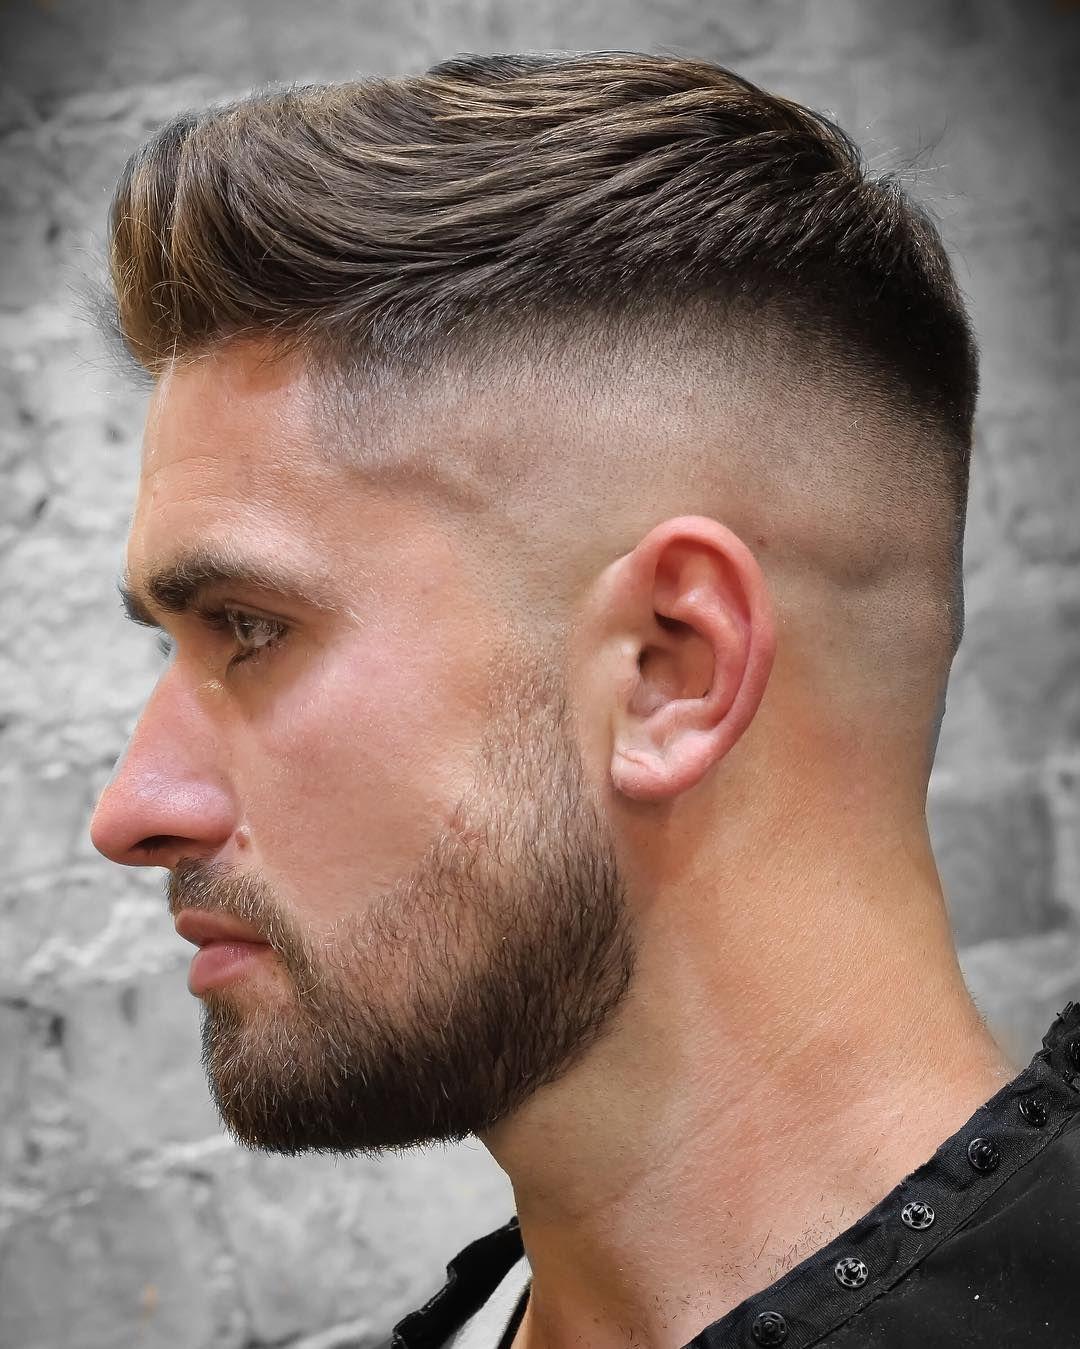 33 Mens Fade Haircuts 2019 Updated Gallery Herenkapsels Herenkapsel Mannenkapsels